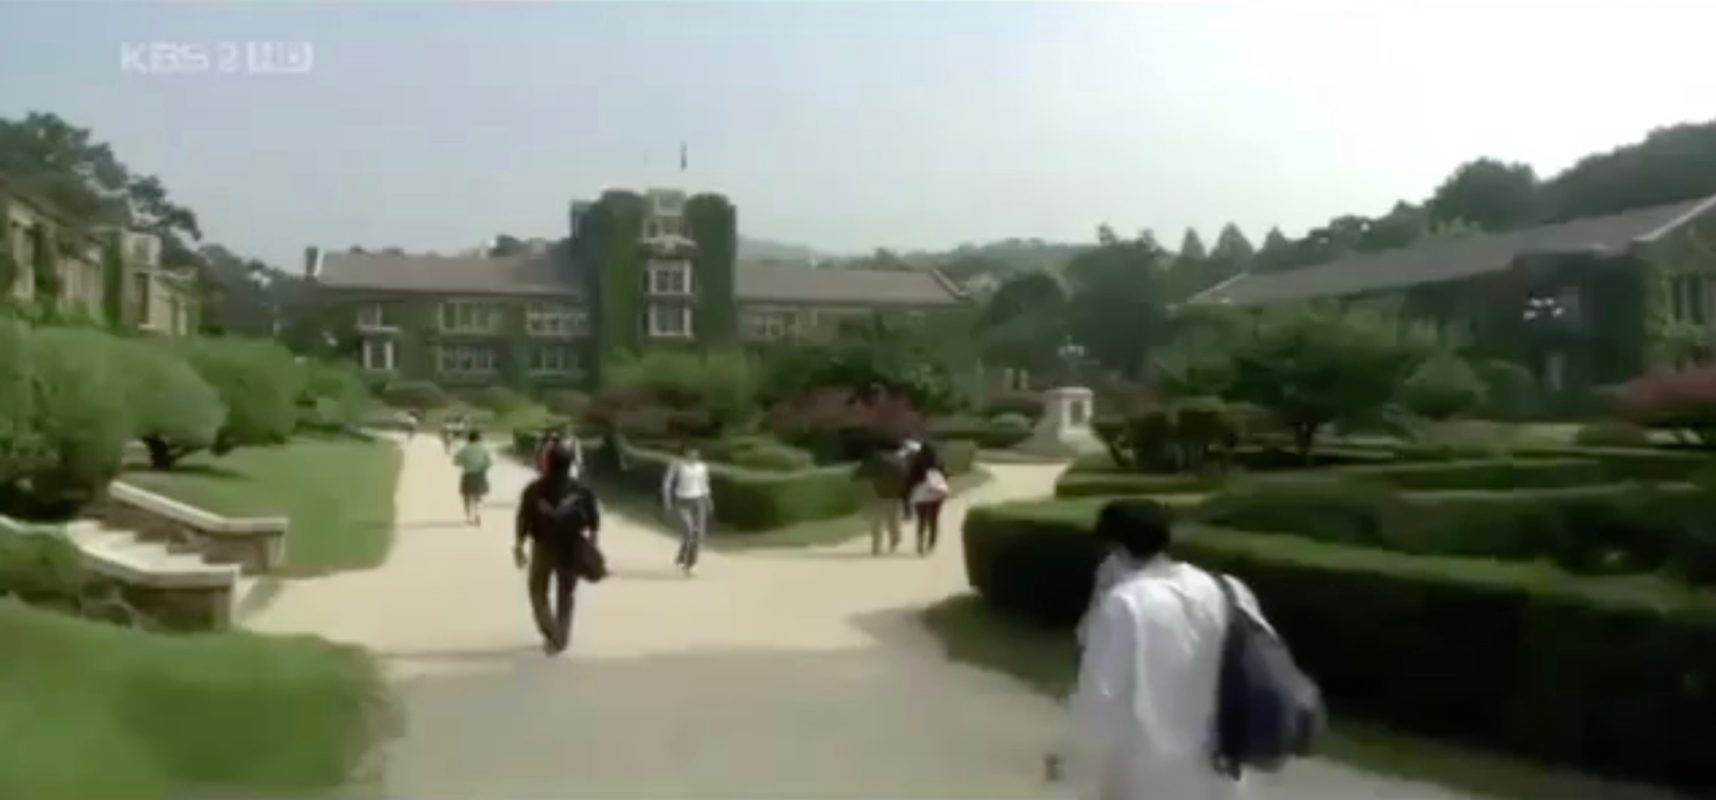 Yonsei University — Sinchon Campus [연세대학교 신촌캠퍼스